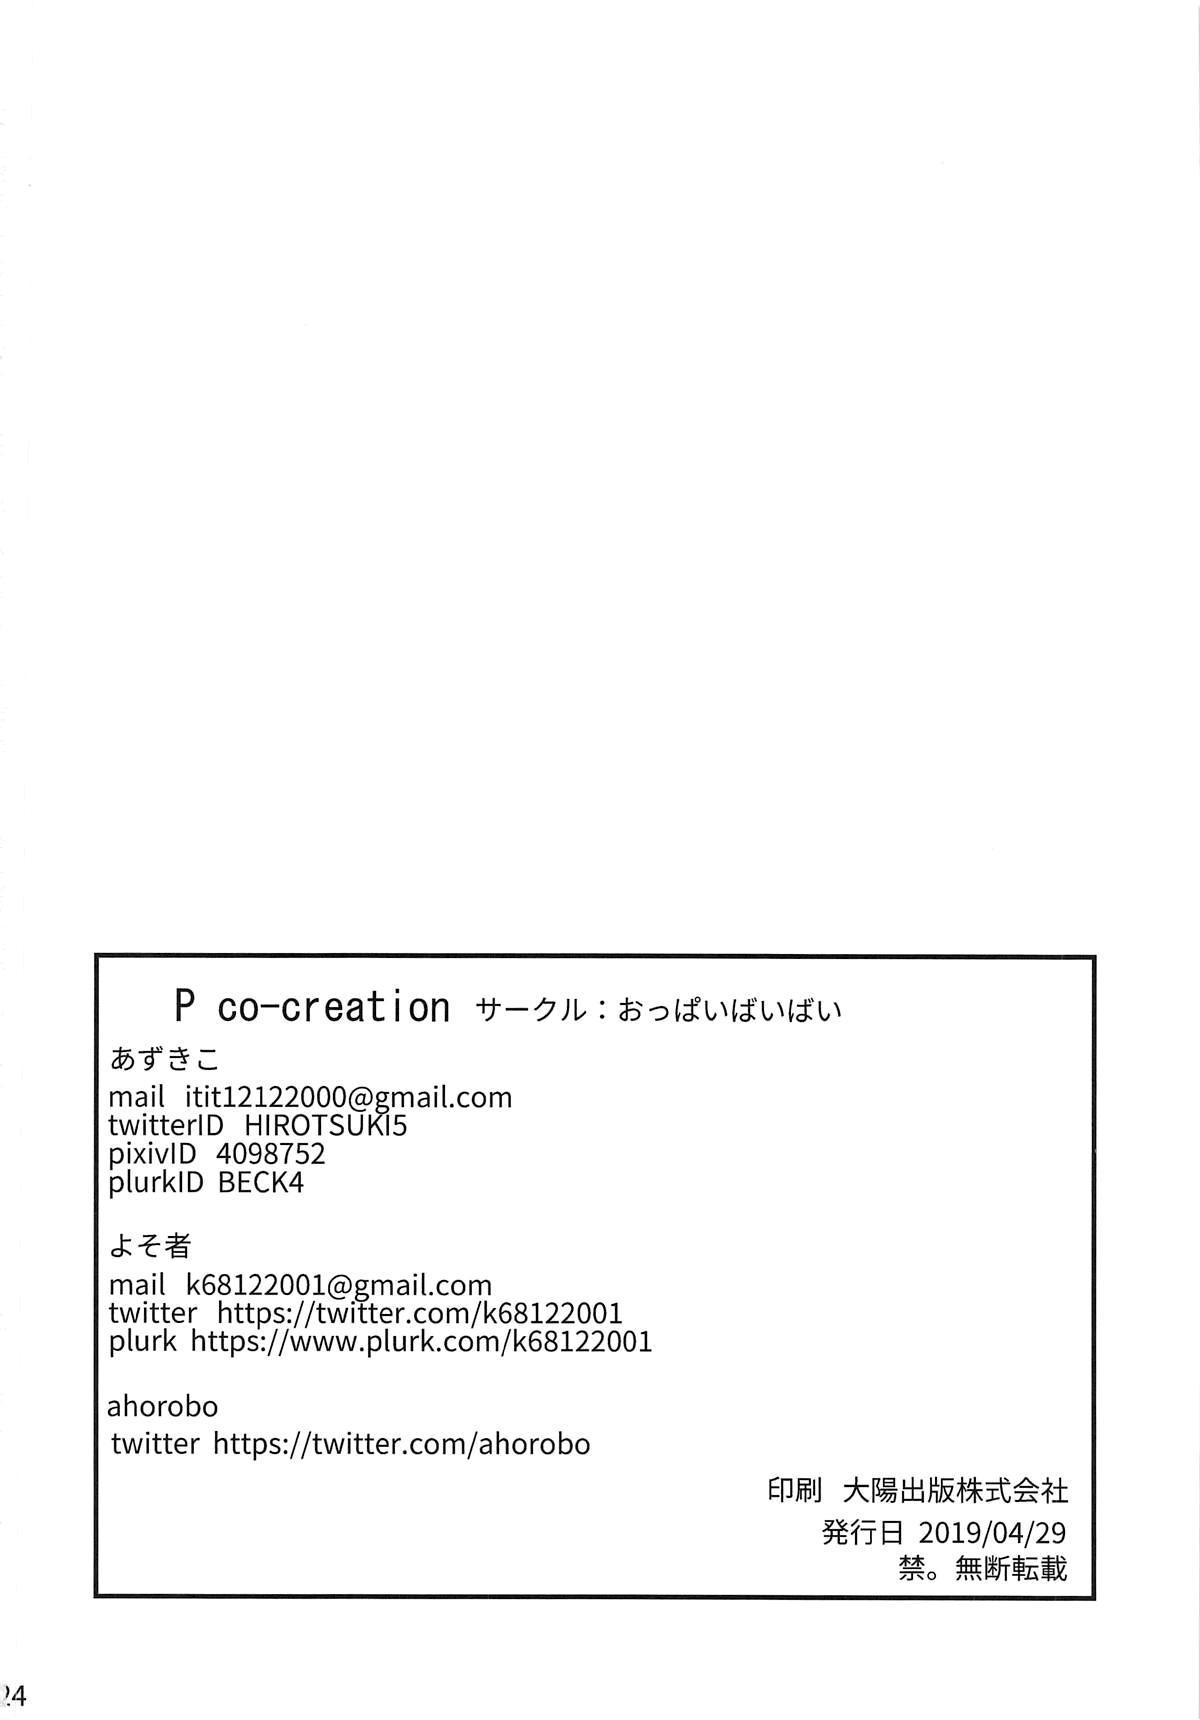 P co-creation 24